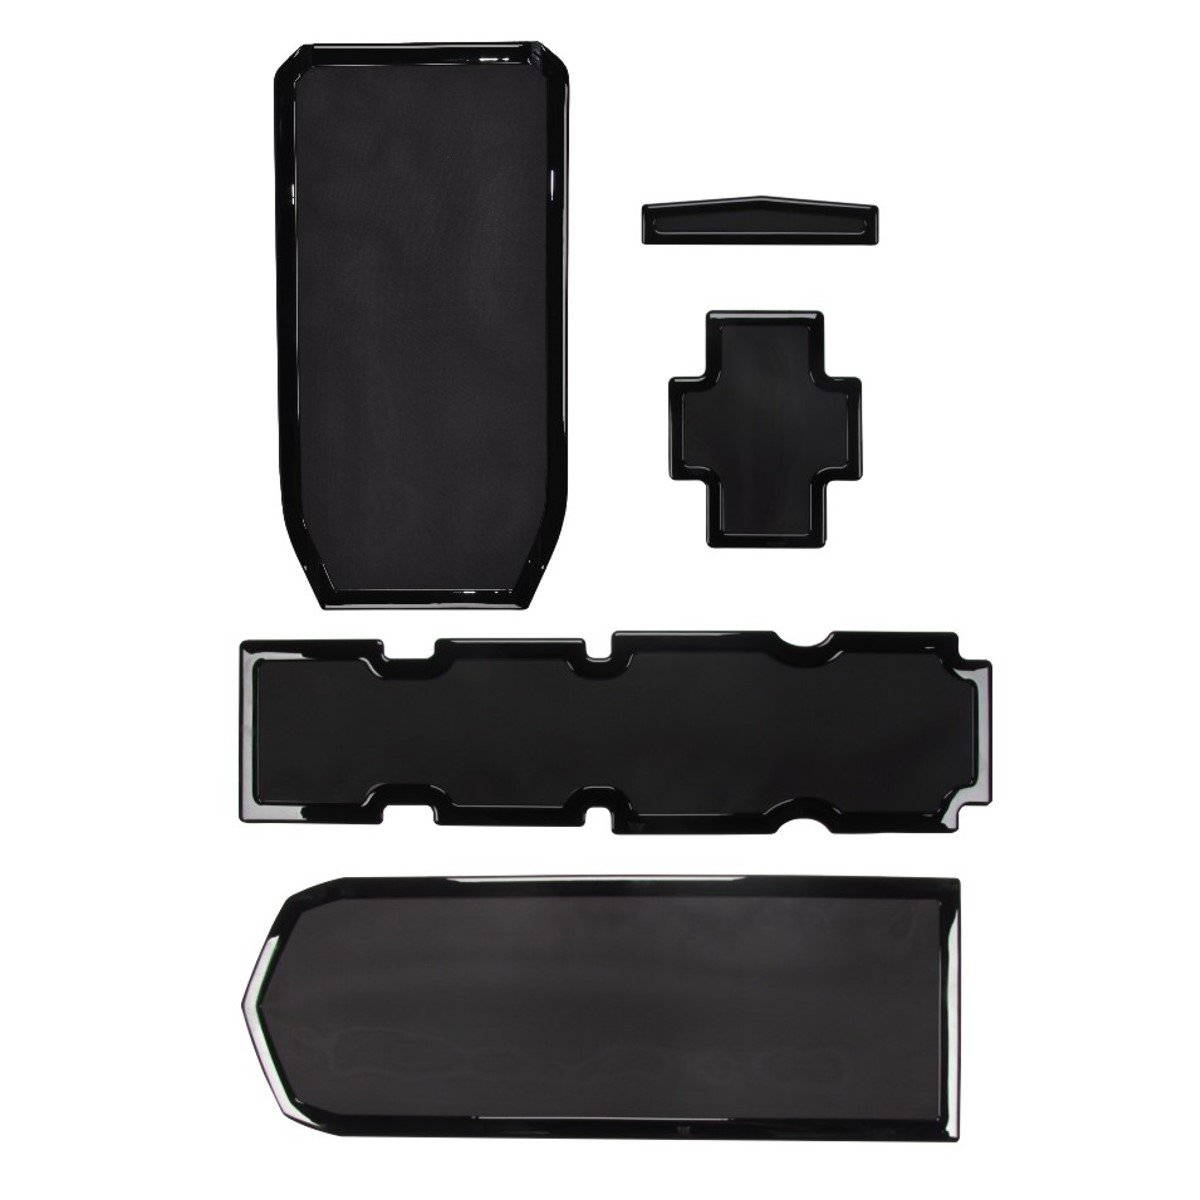 DEMCiflex Dust Filter Kit for Corsair Graphite 780T by DEMCiflex